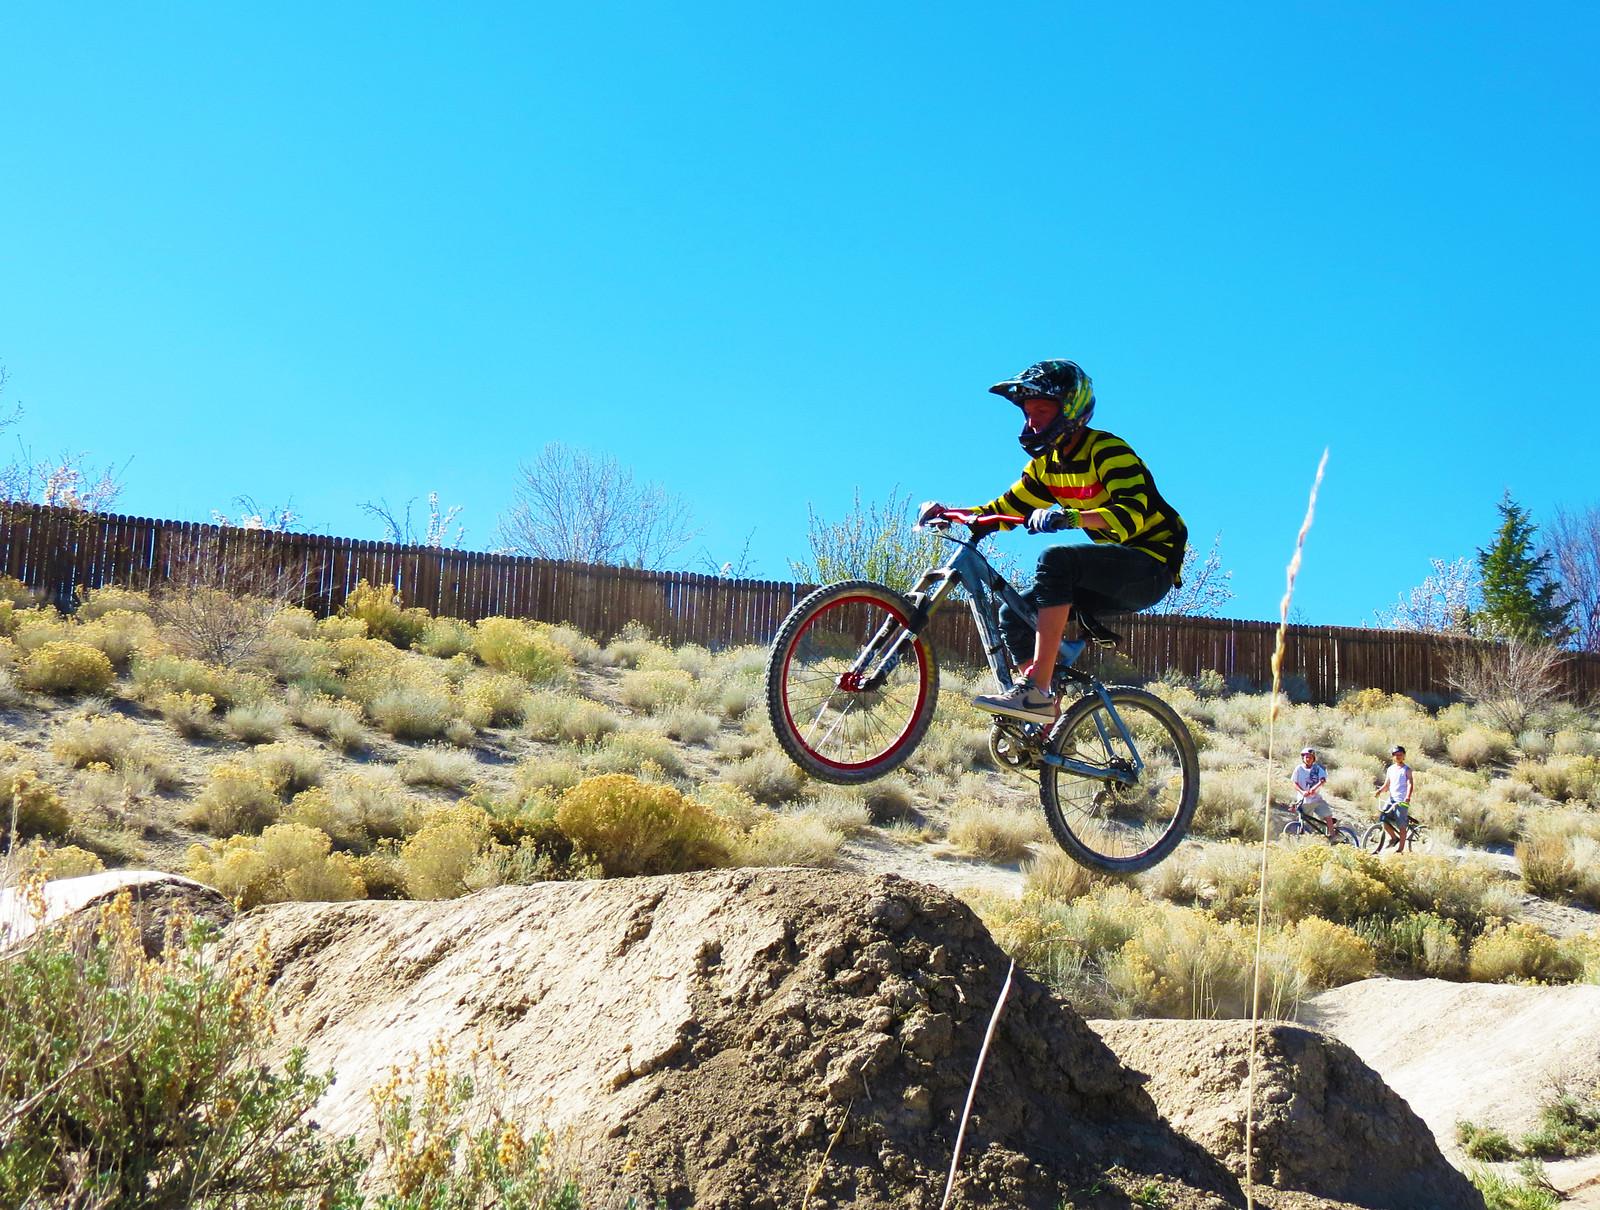 day 3 jump 1 crop - Moosey - Mountain Biking Pictures - Vital MTB